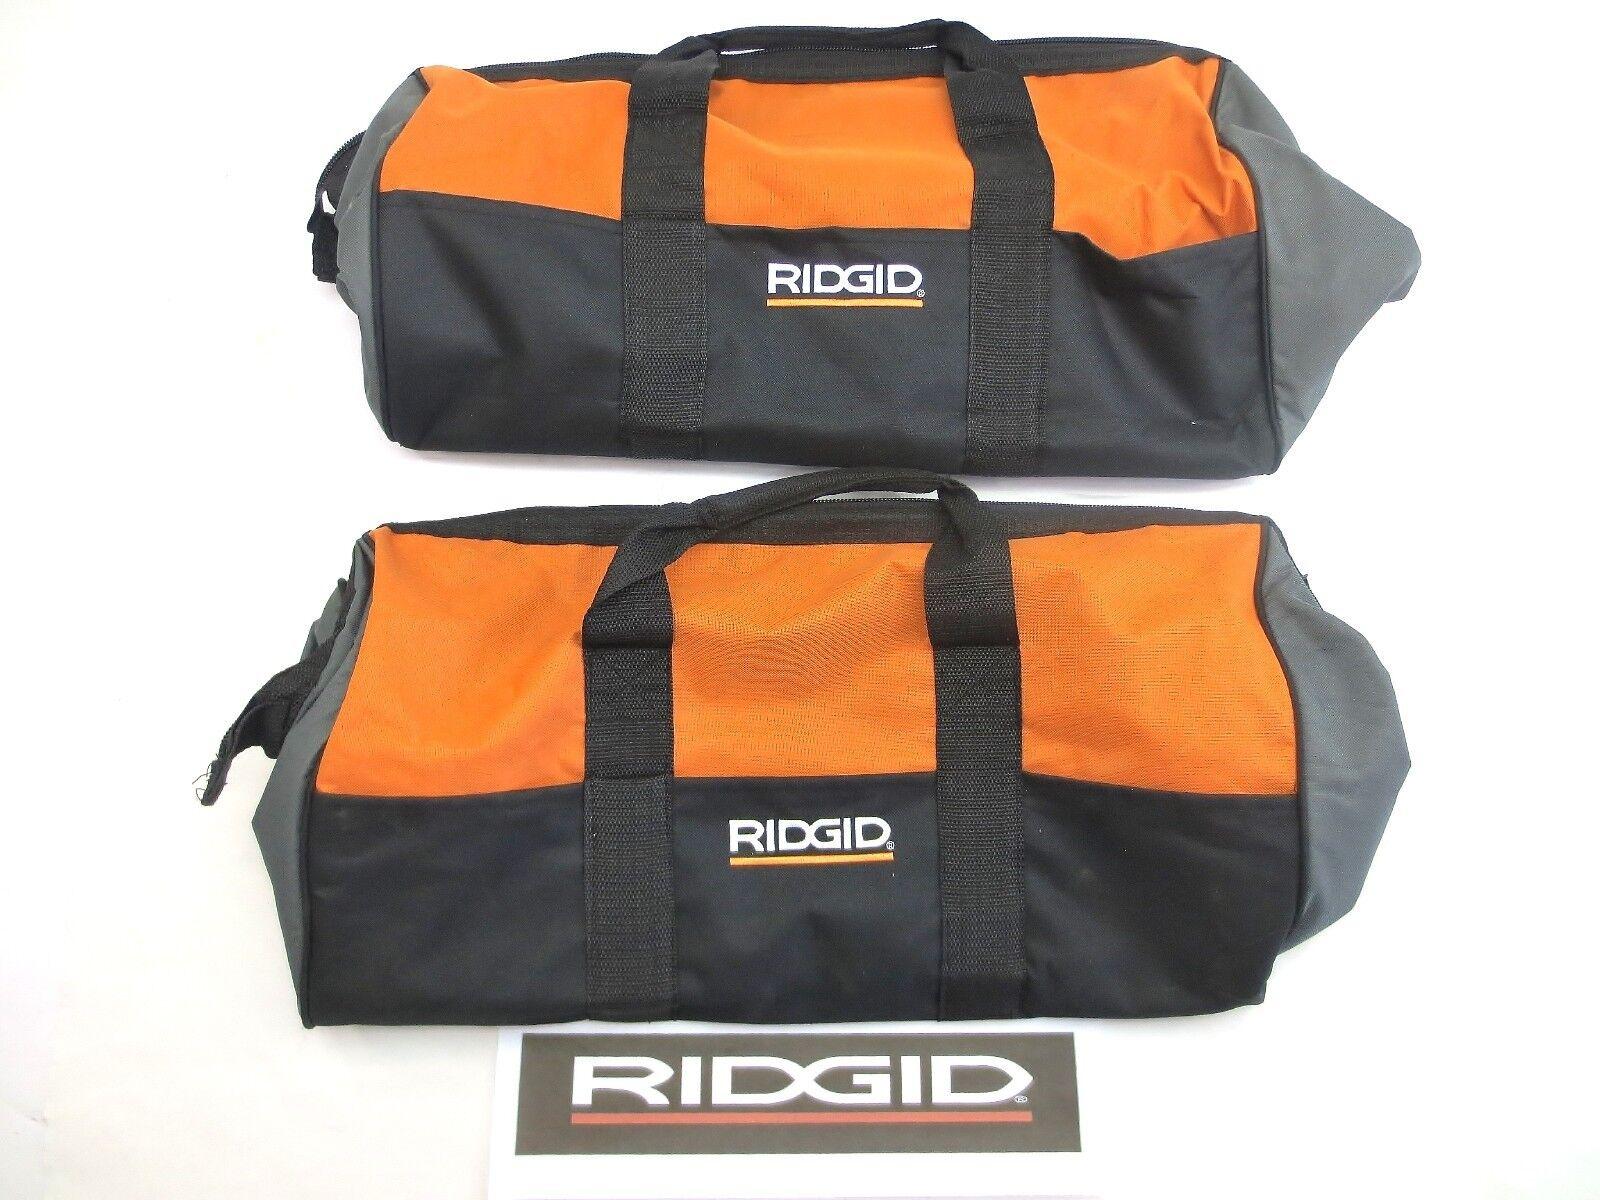 2) RIDGID LARGE (22X10X13) TOOL BAGS FOR DRILL IMPACT SAW CASE BAG 18v 18 VOLT